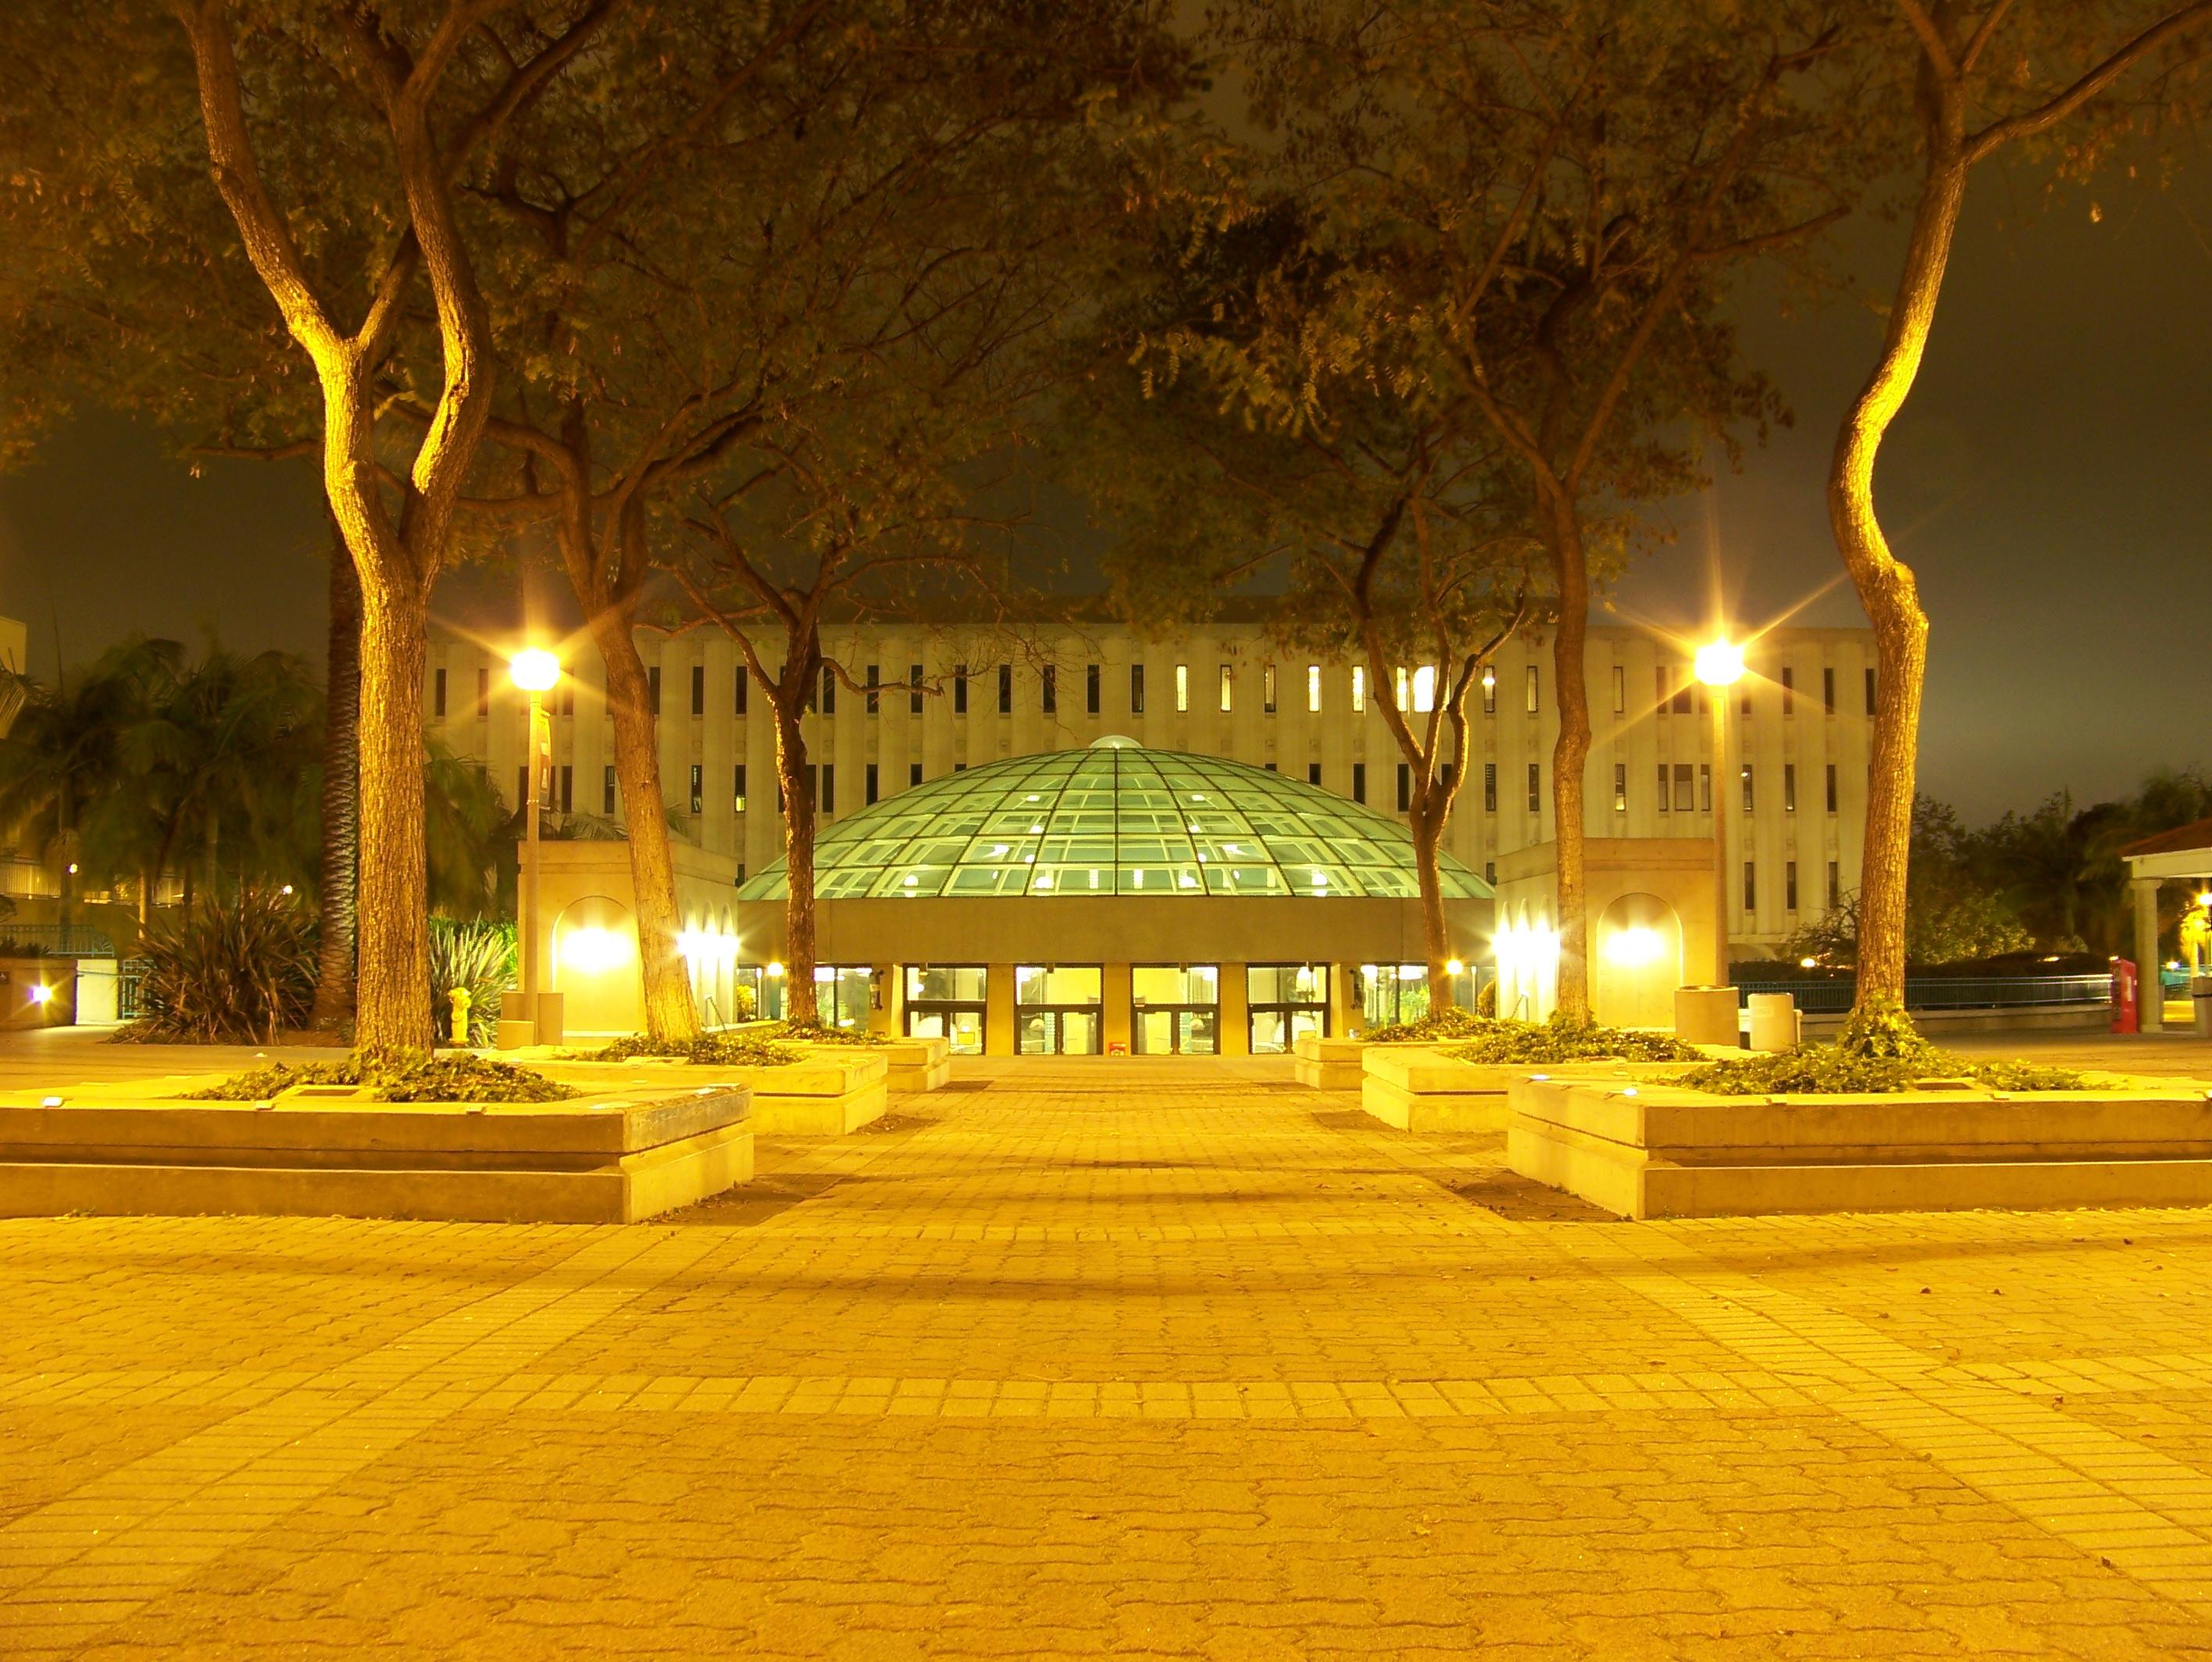 san_diego_university_library_116.jpg